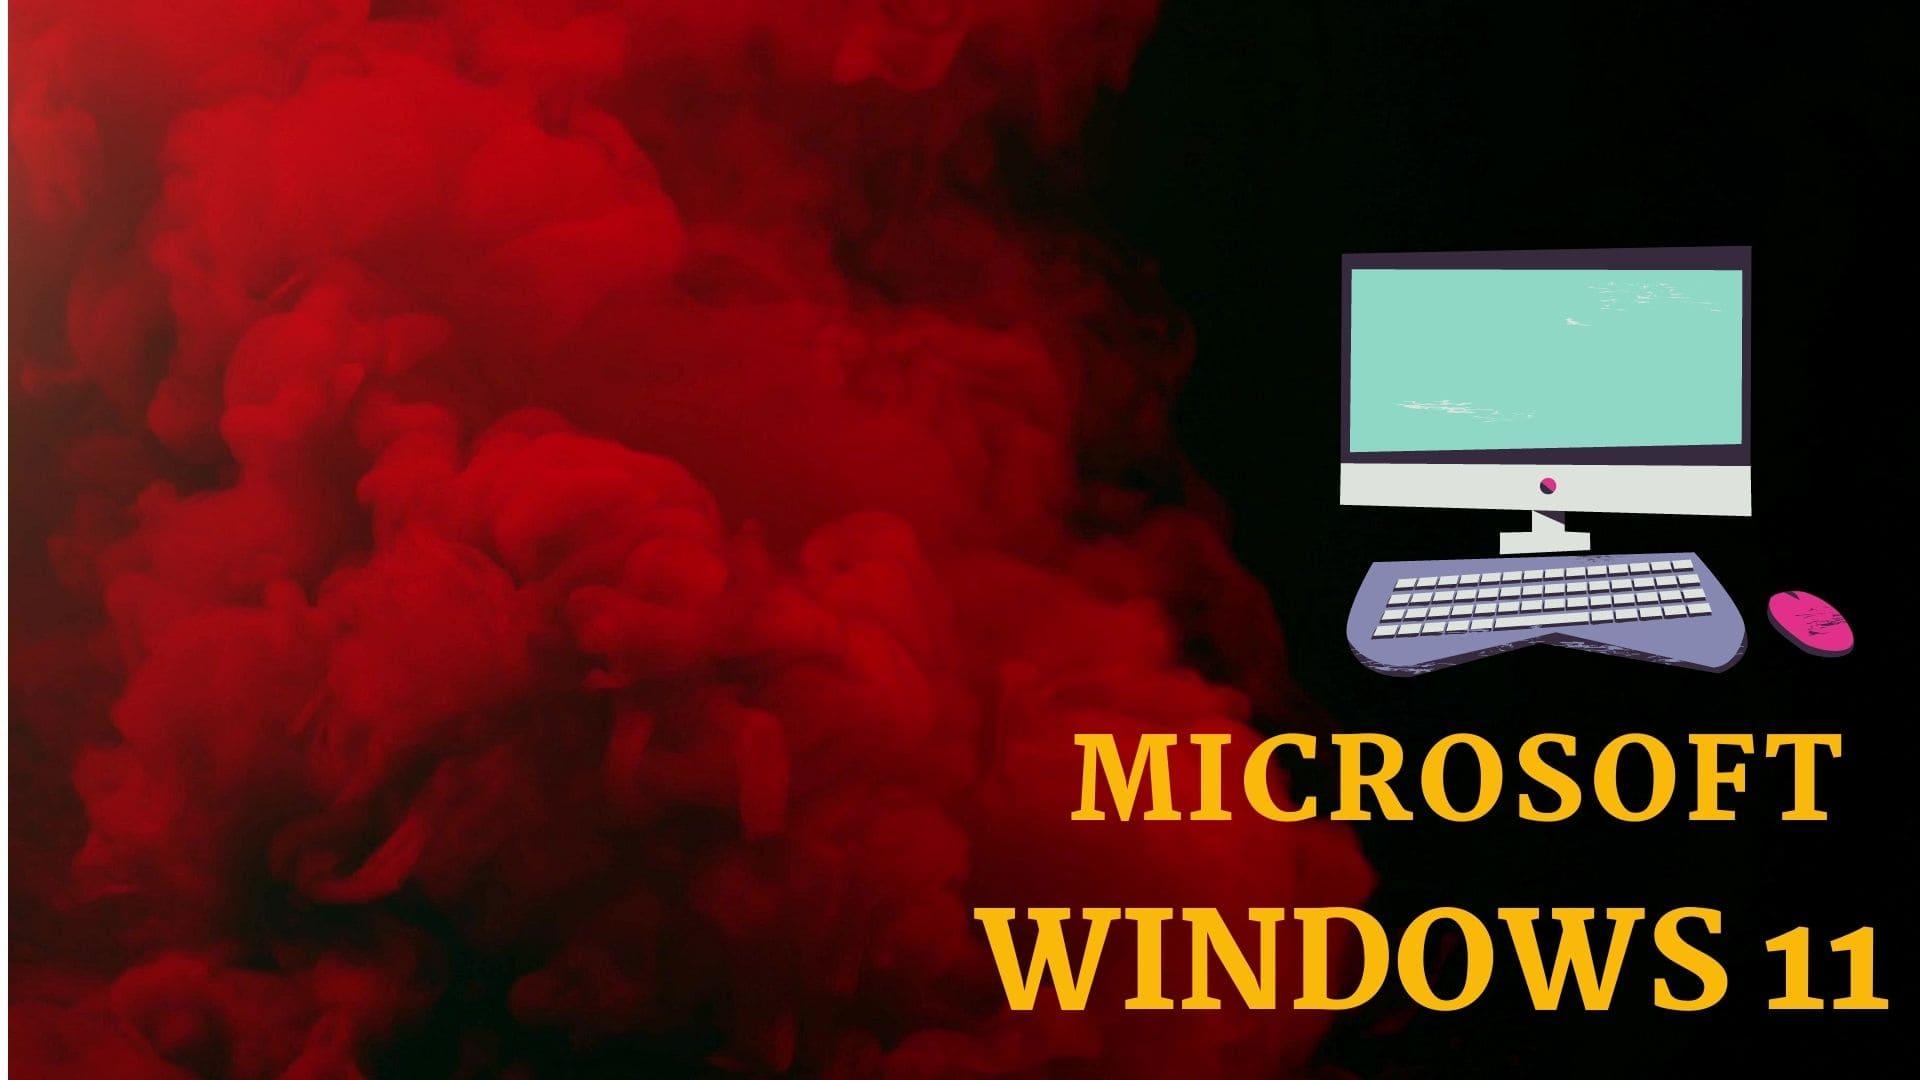 windows 11 advance features